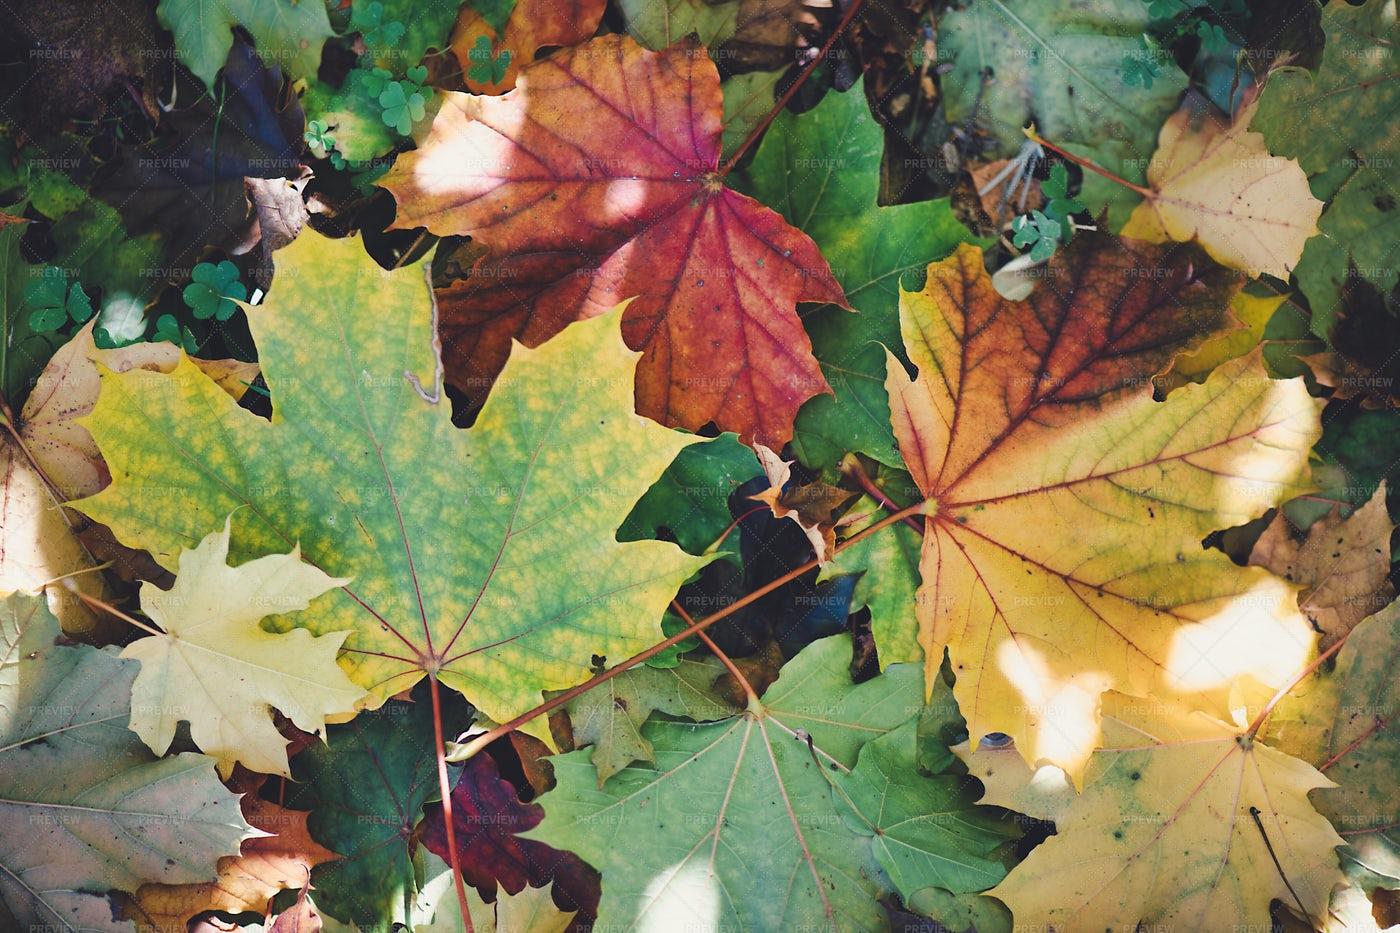 Autumn Leaves Close-Up: Stock Photos